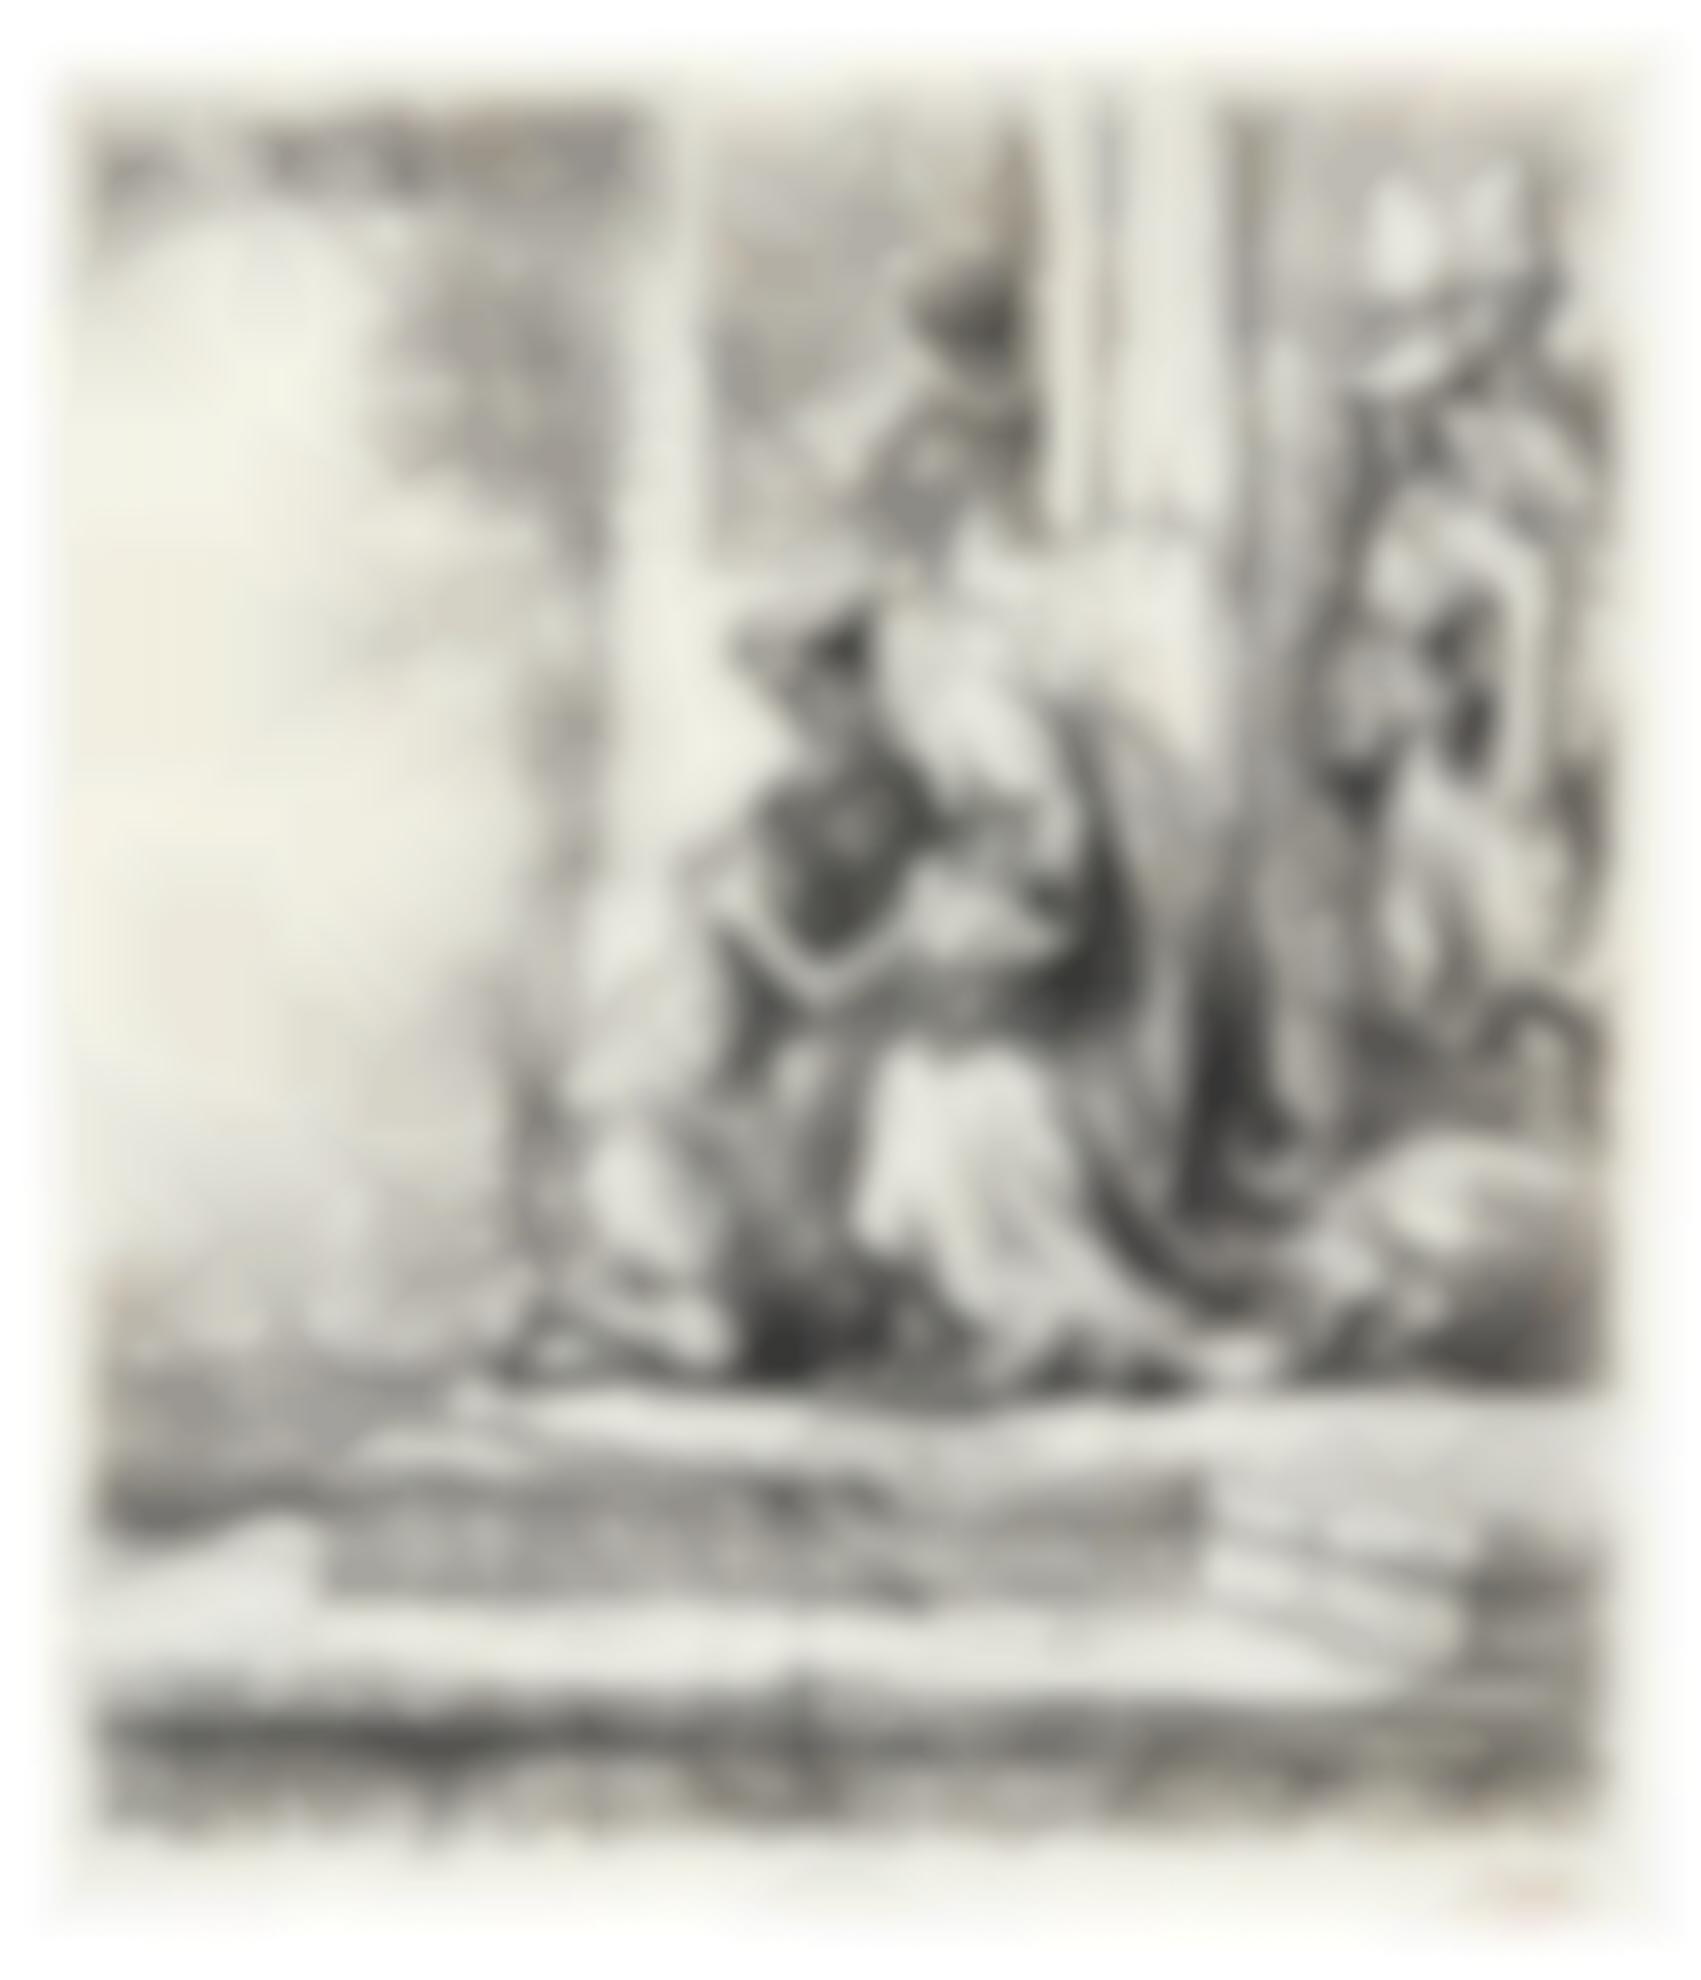 Rembrandt van Rijn-The Return Of The Prodigal Son (B., Holl. 91; New Holl. 159; H. 147)-1636